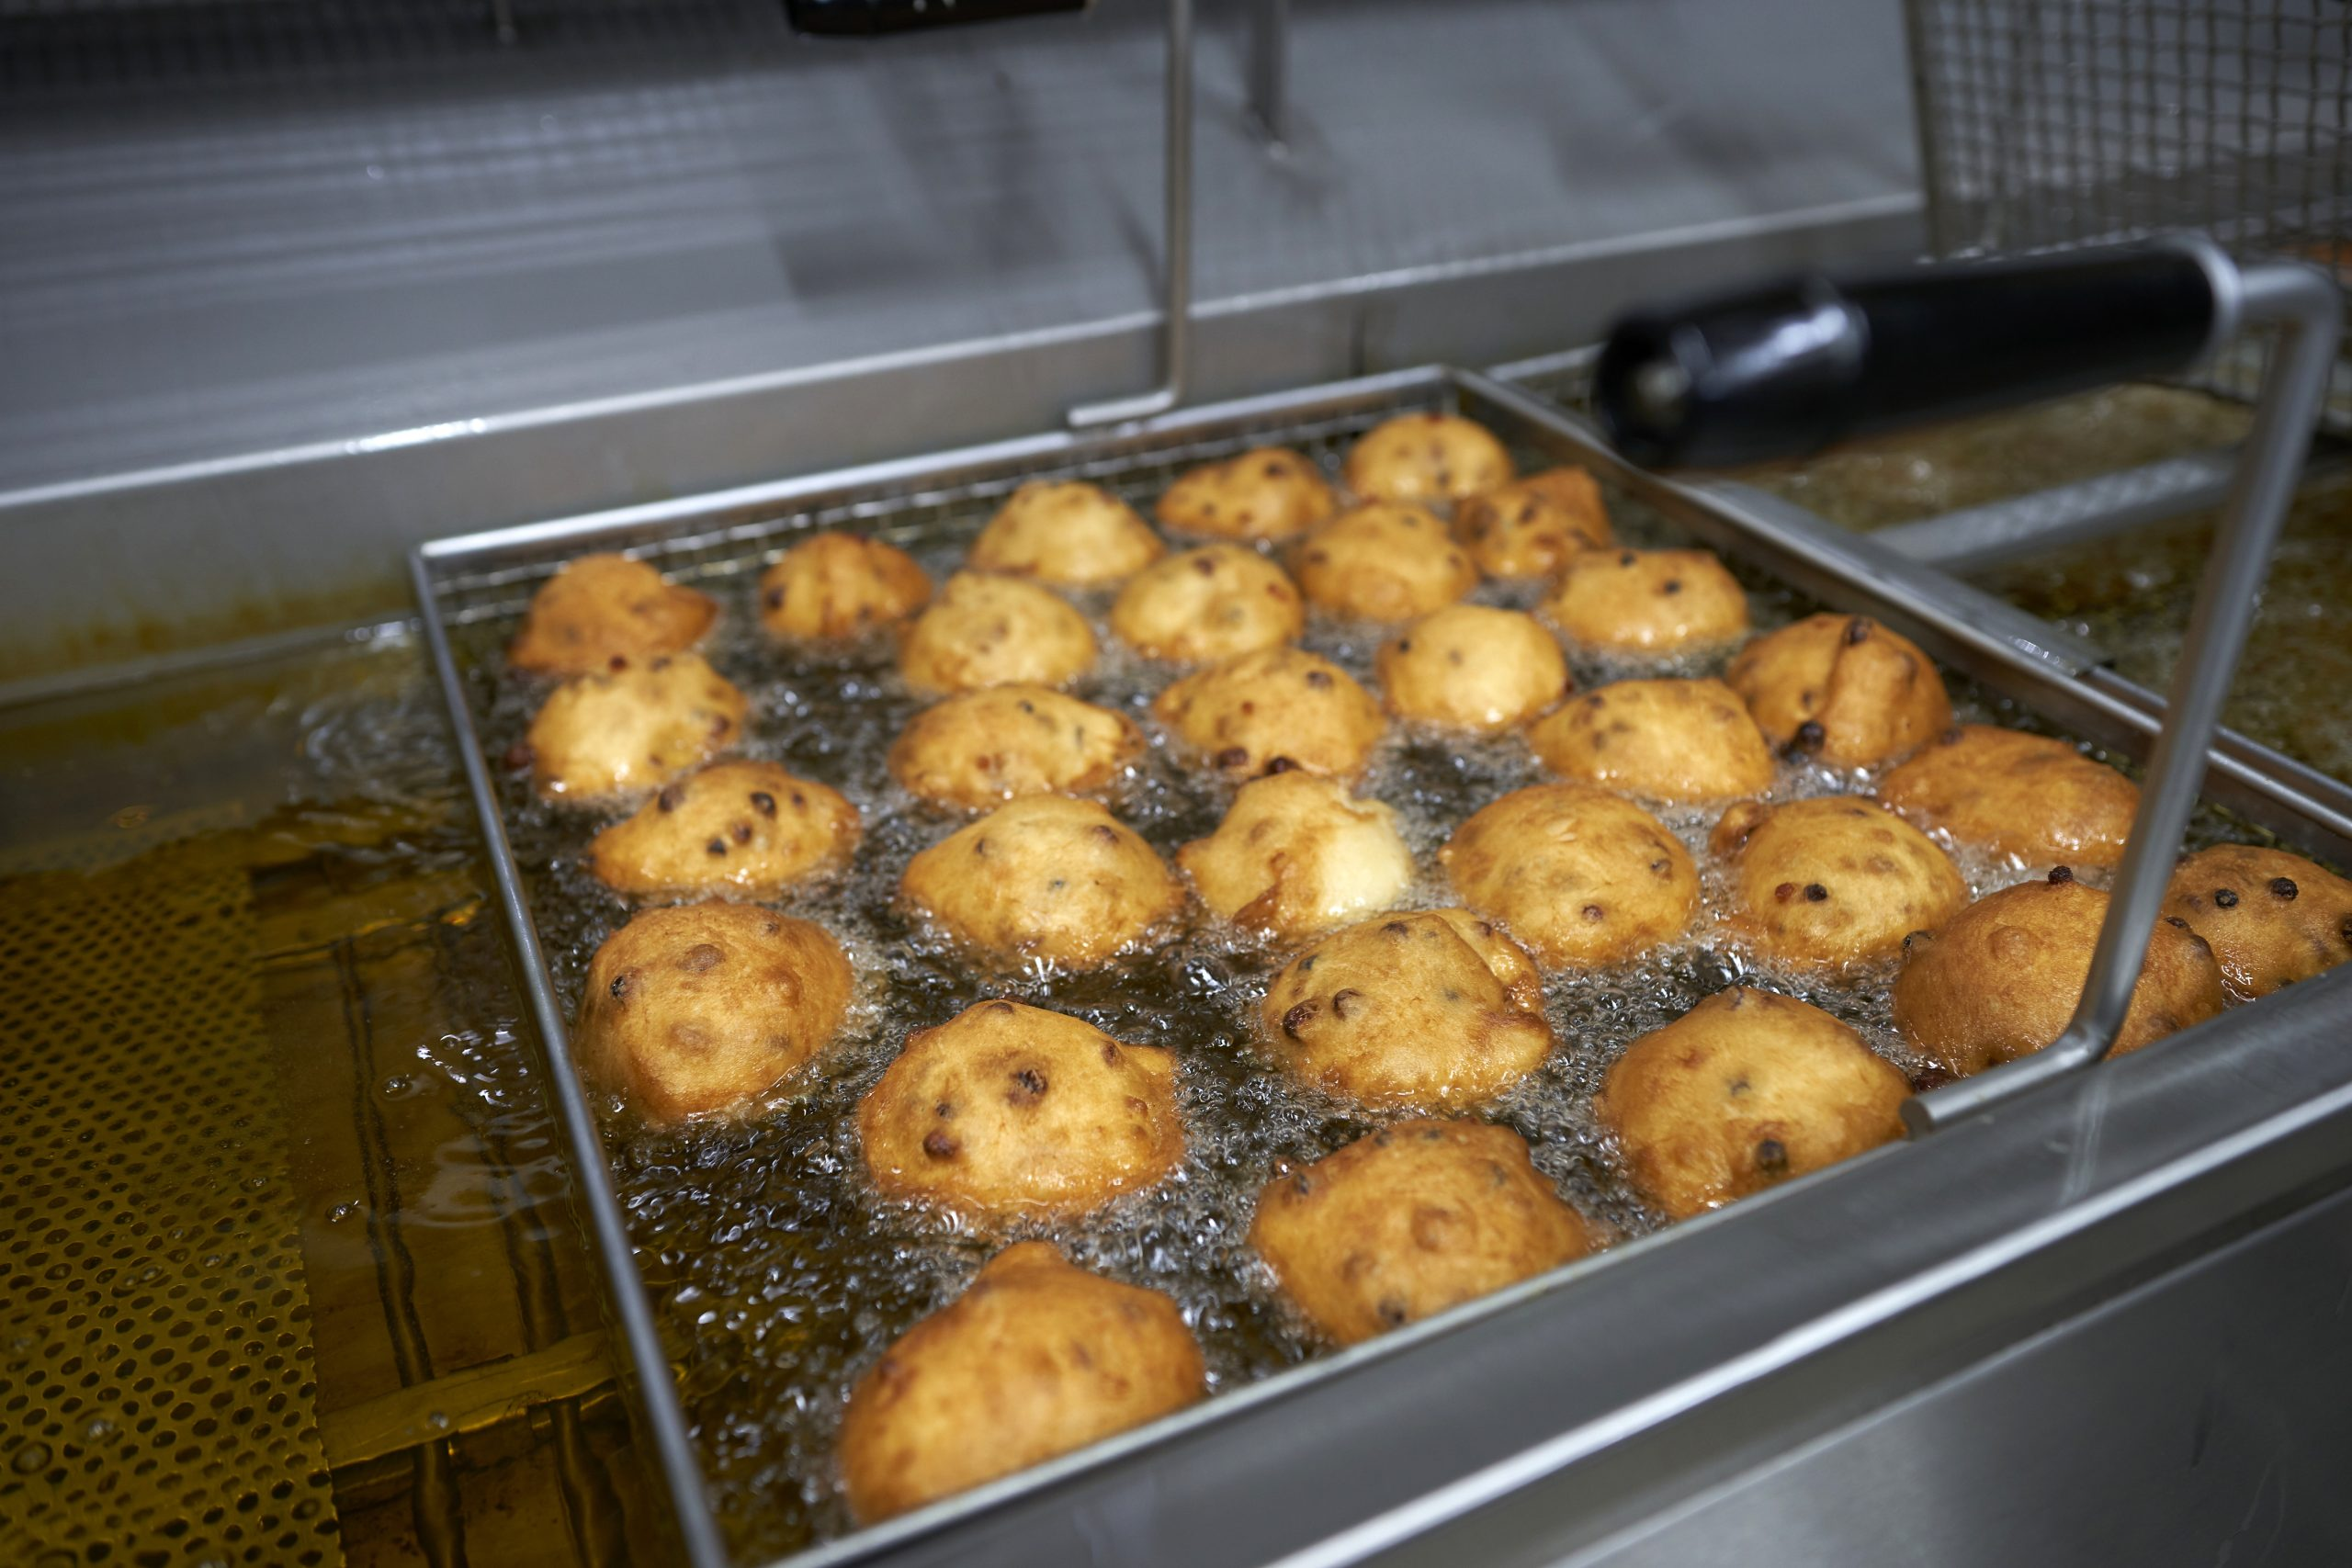 Oliebollendemo Food Innovation Academy